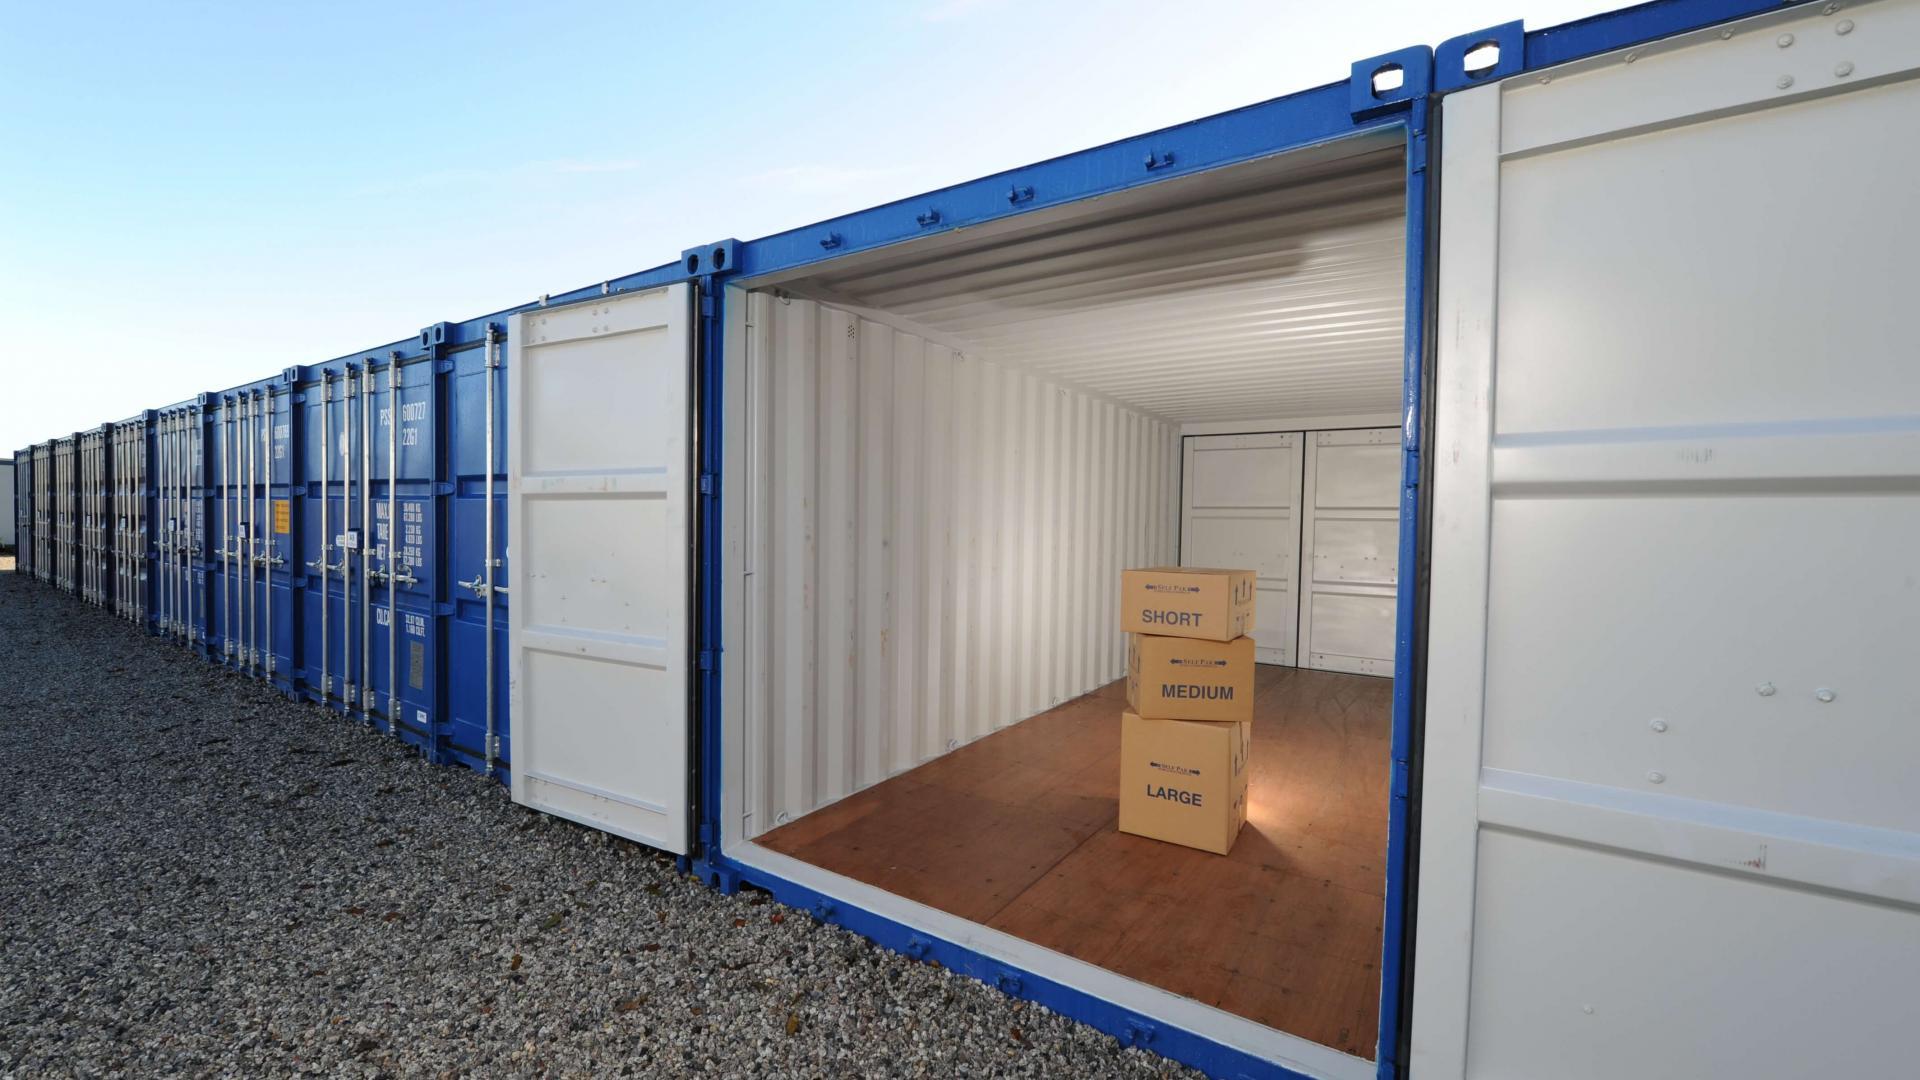 6 Different Unit Sizes Drive Up Units Access 7 Days